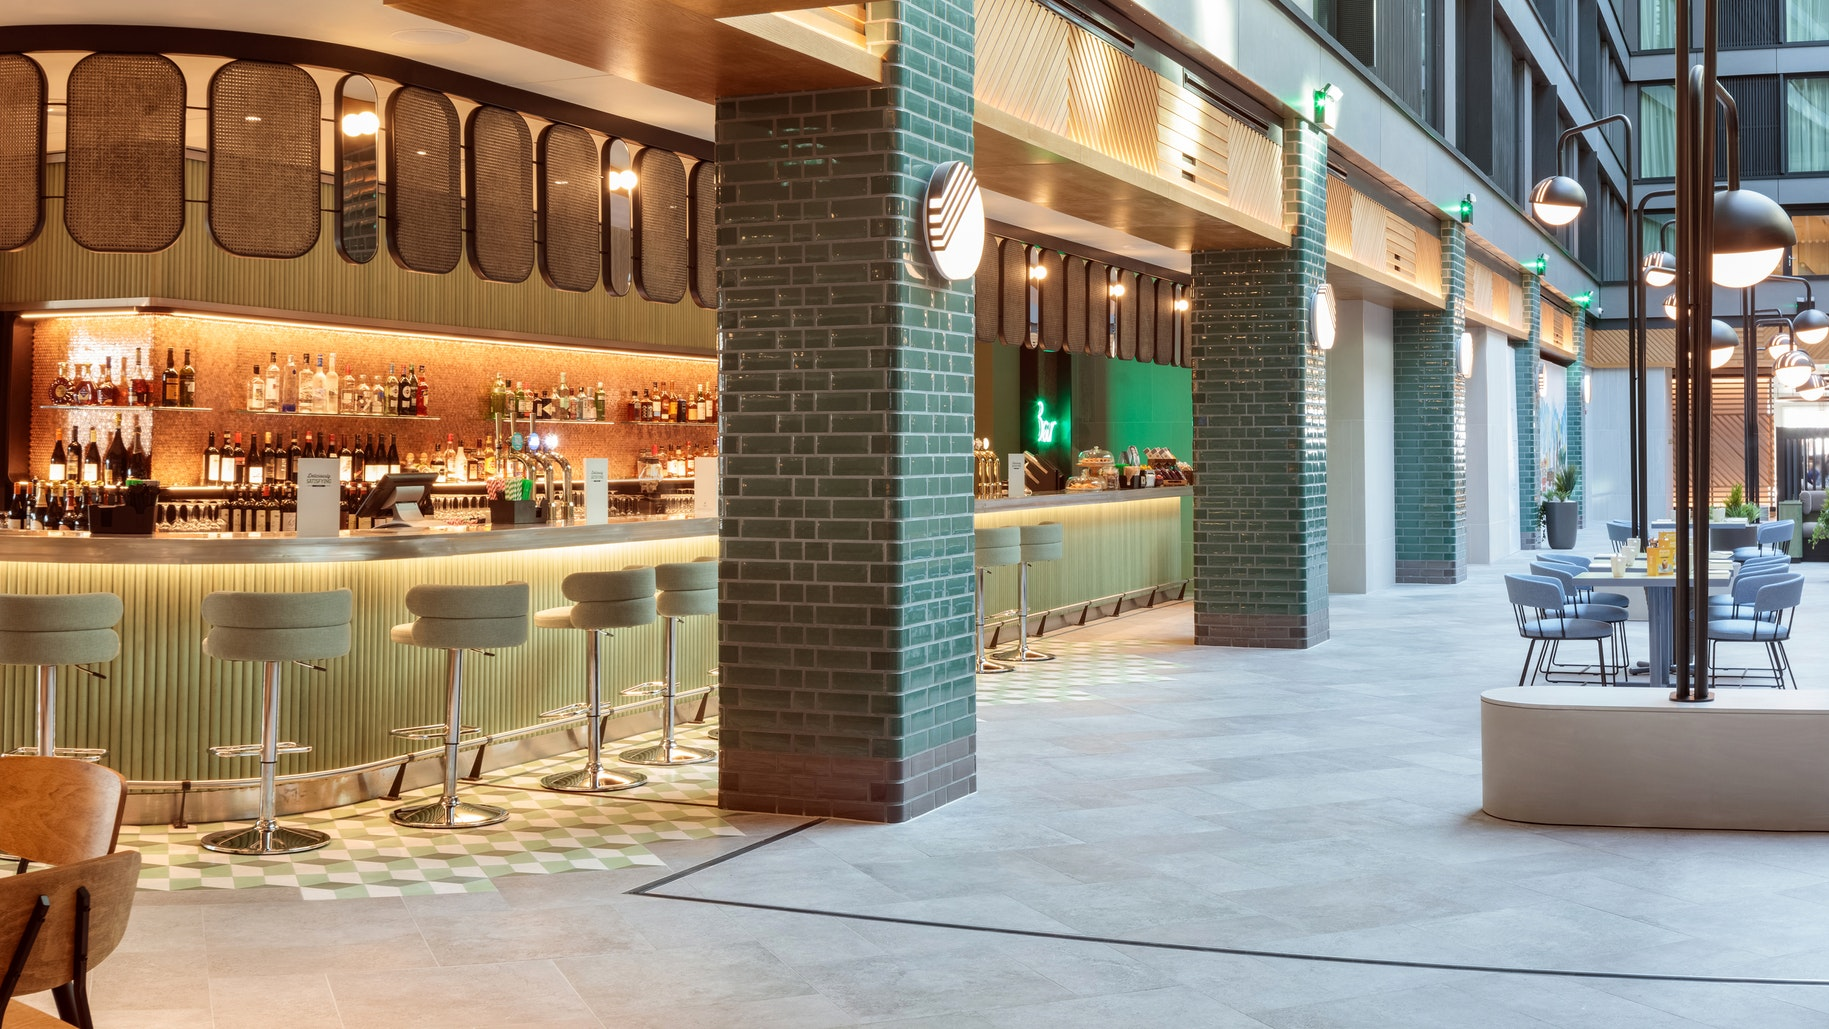 Staybridge Suites Heathrow near LEGOLAND Windsor Resort.